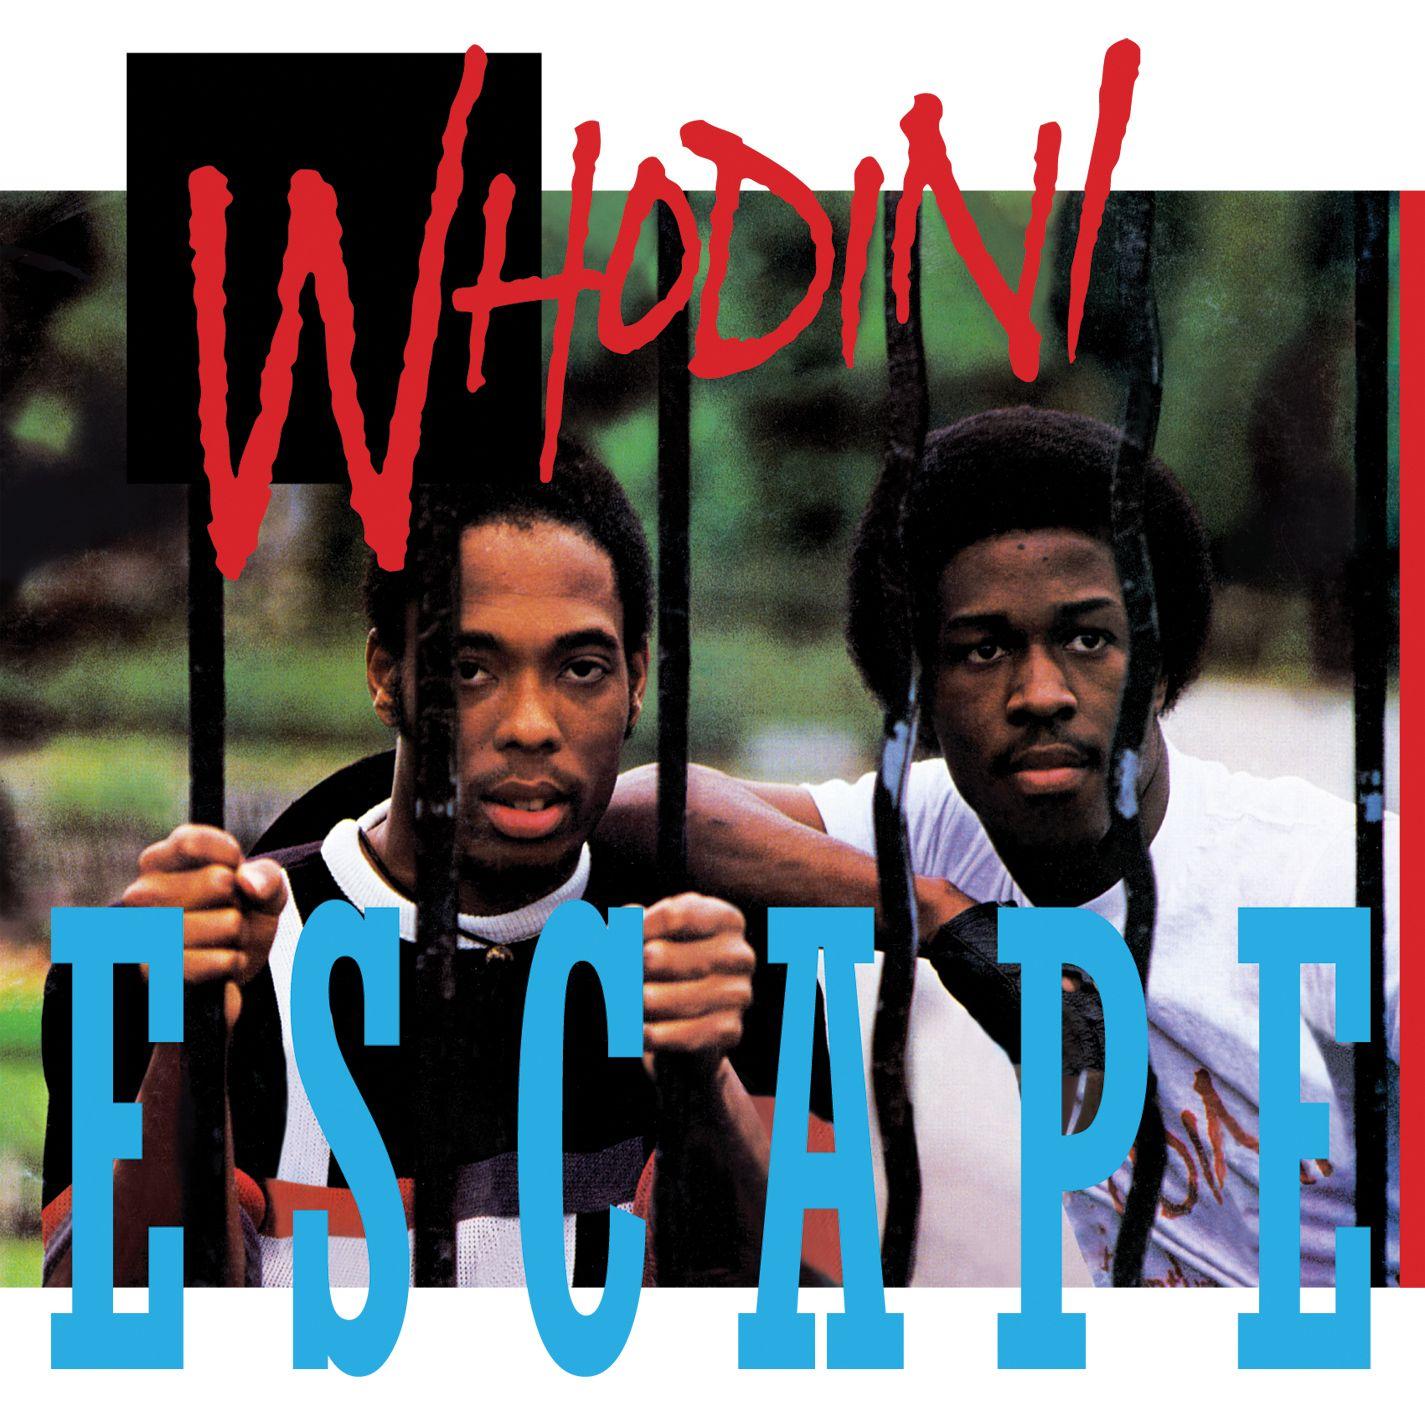 Whodini: 'Escape' (1984)  Much more than 'Five Minutes Of